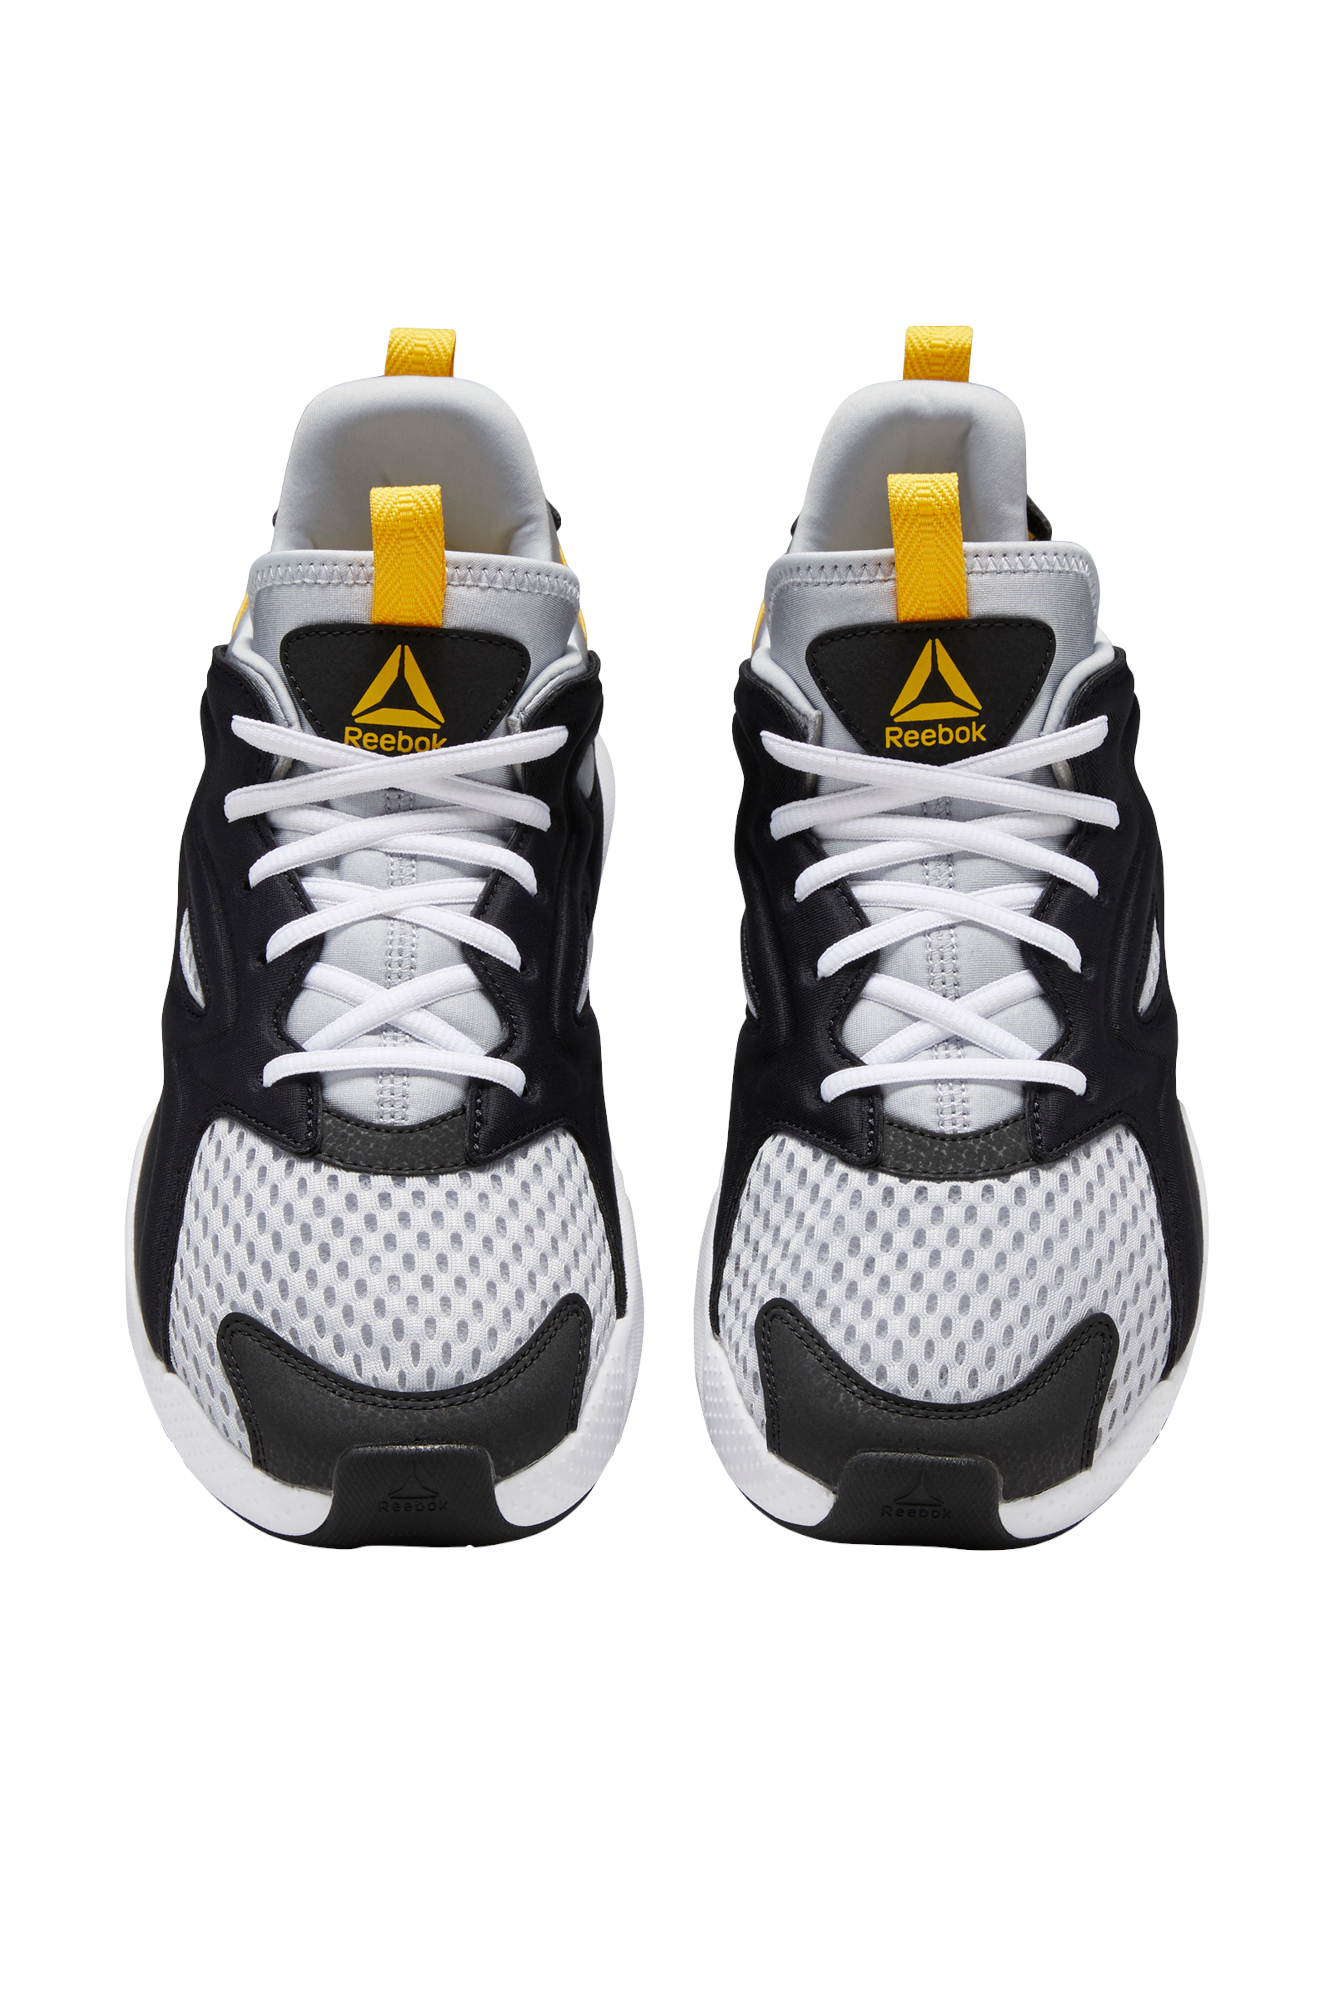 Reebok Fury Adapt Multi Color Running Shoes